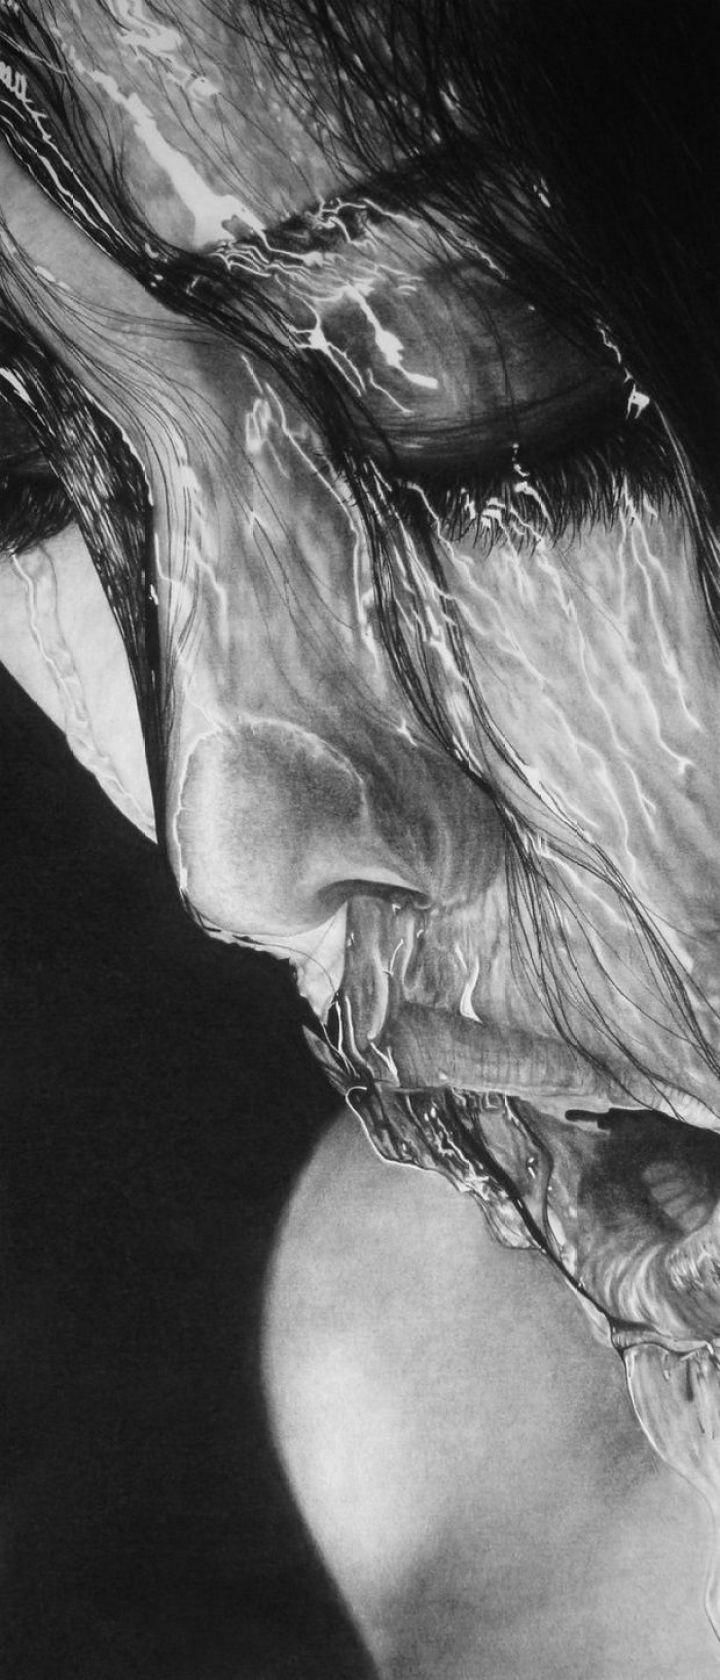 25 Amazingly Realistic Art Paintings - Daisy - Charcoal.